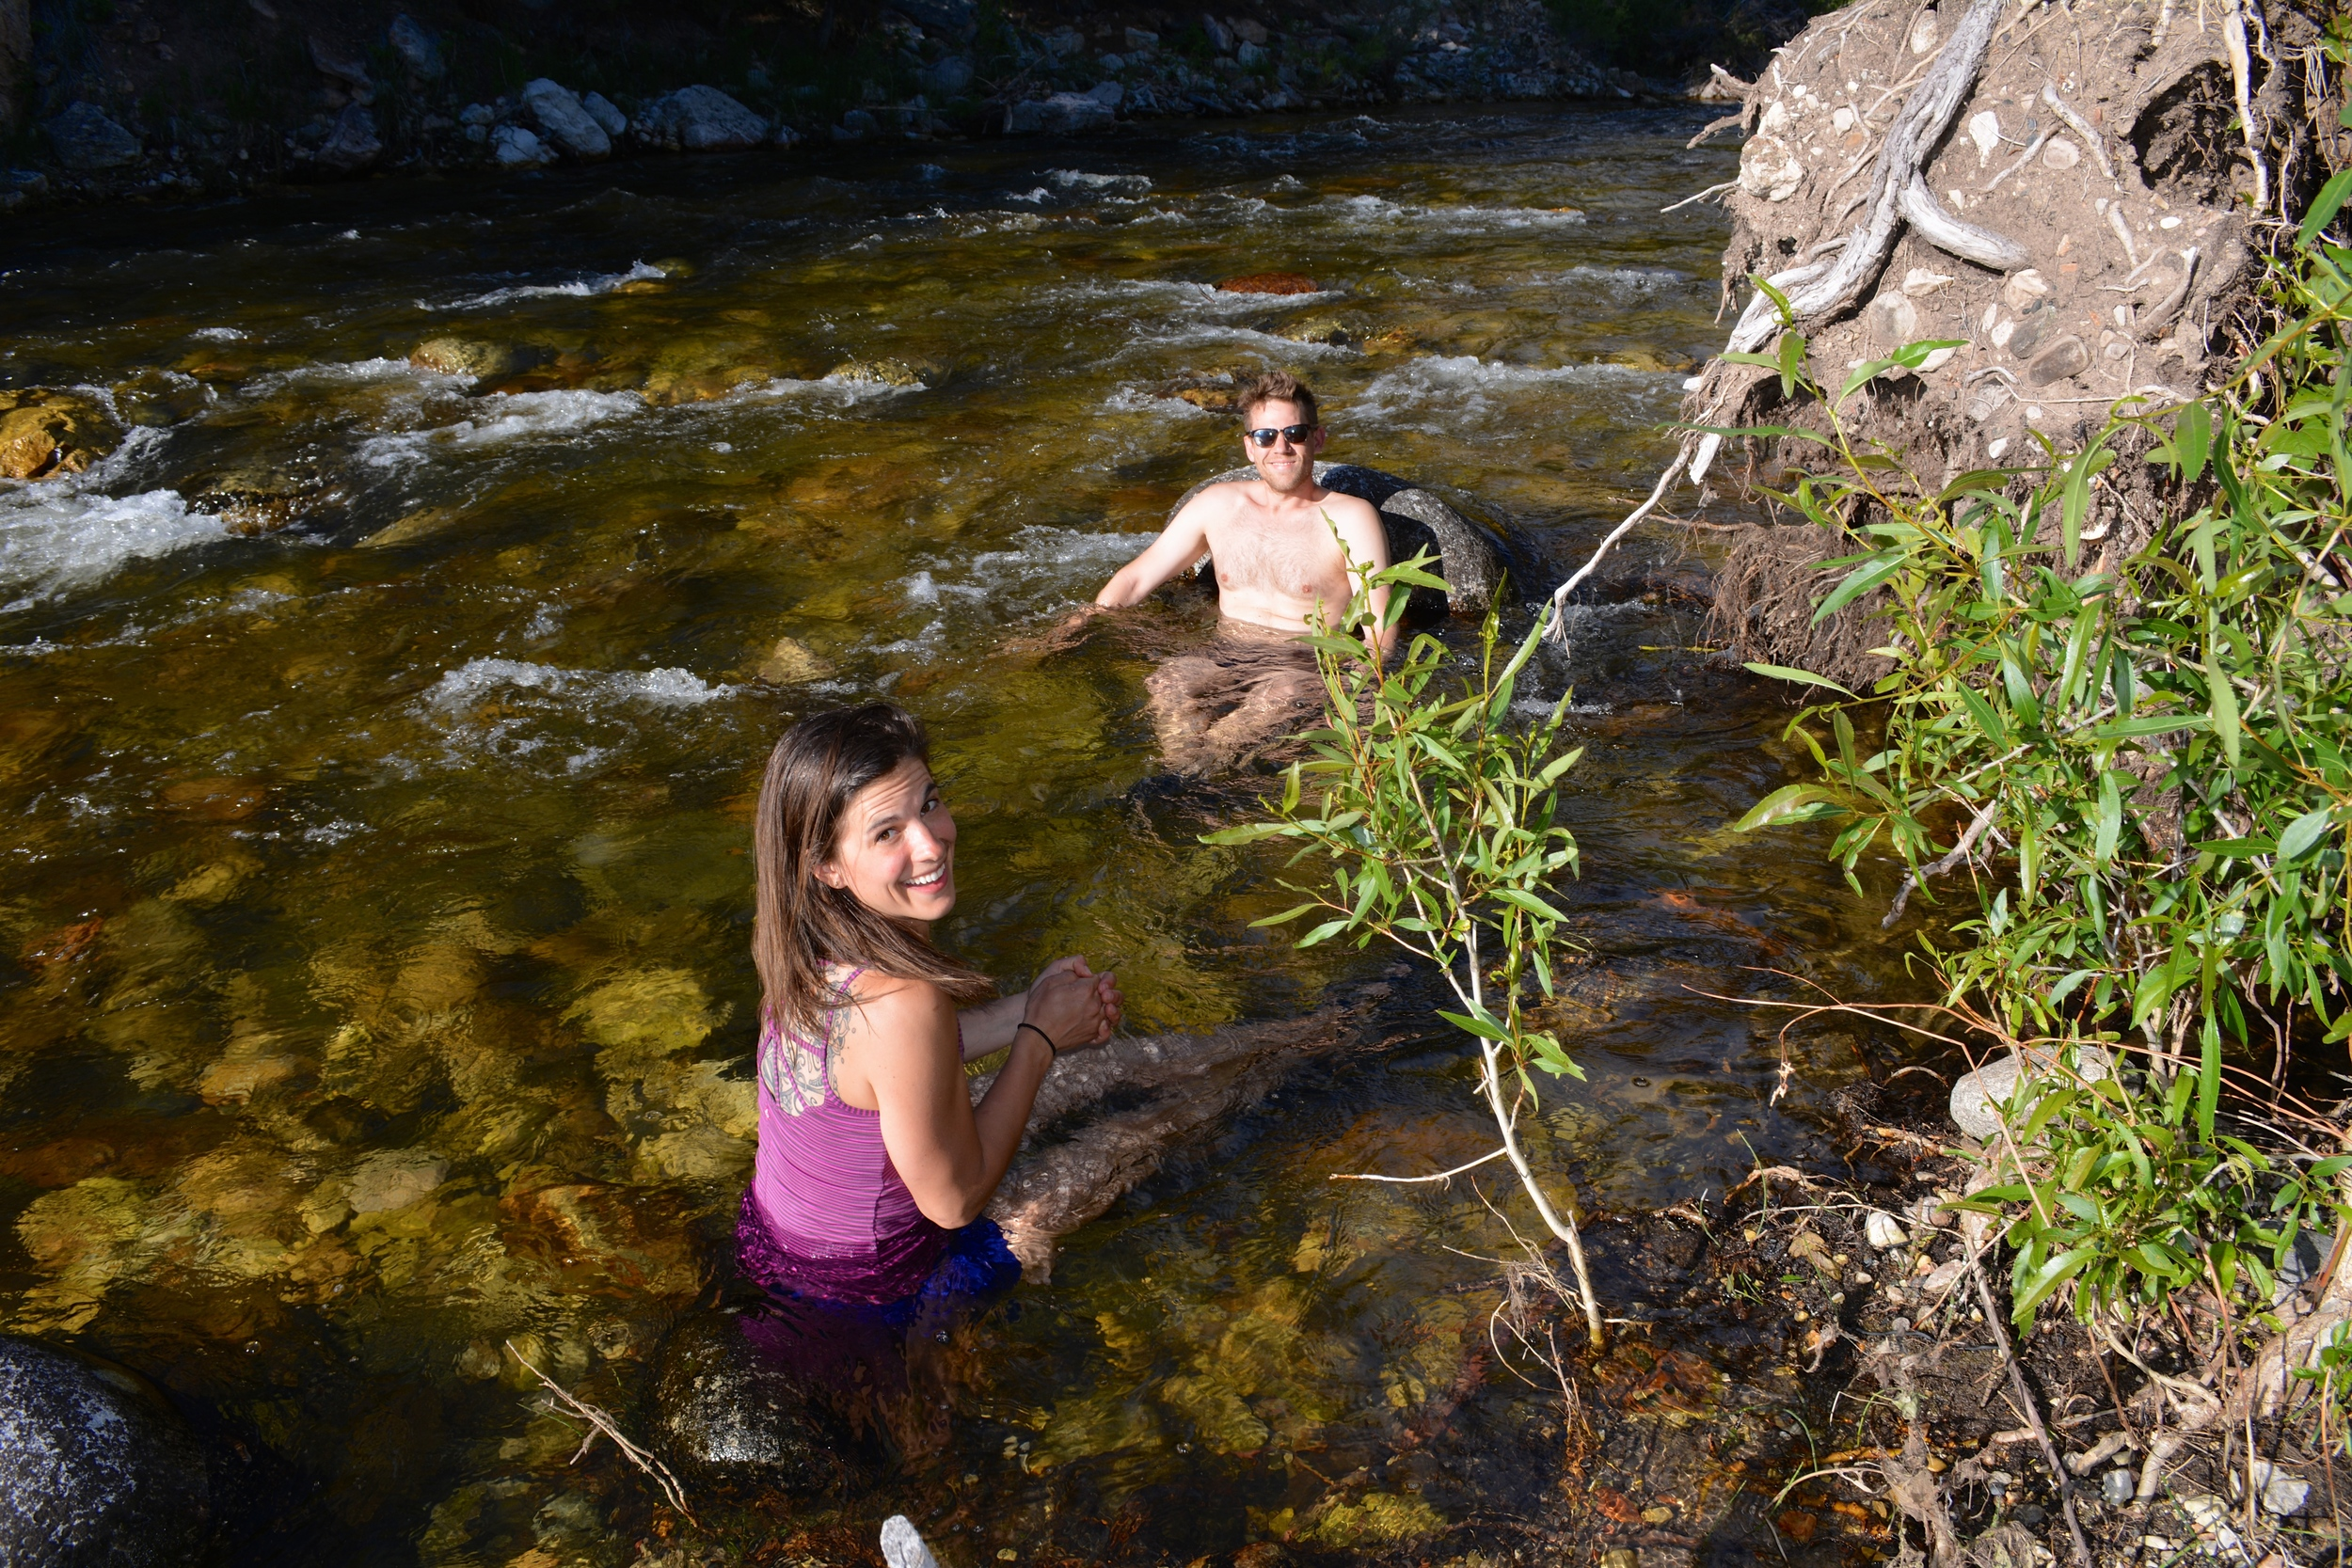 Anne and Michael taking a river bath.